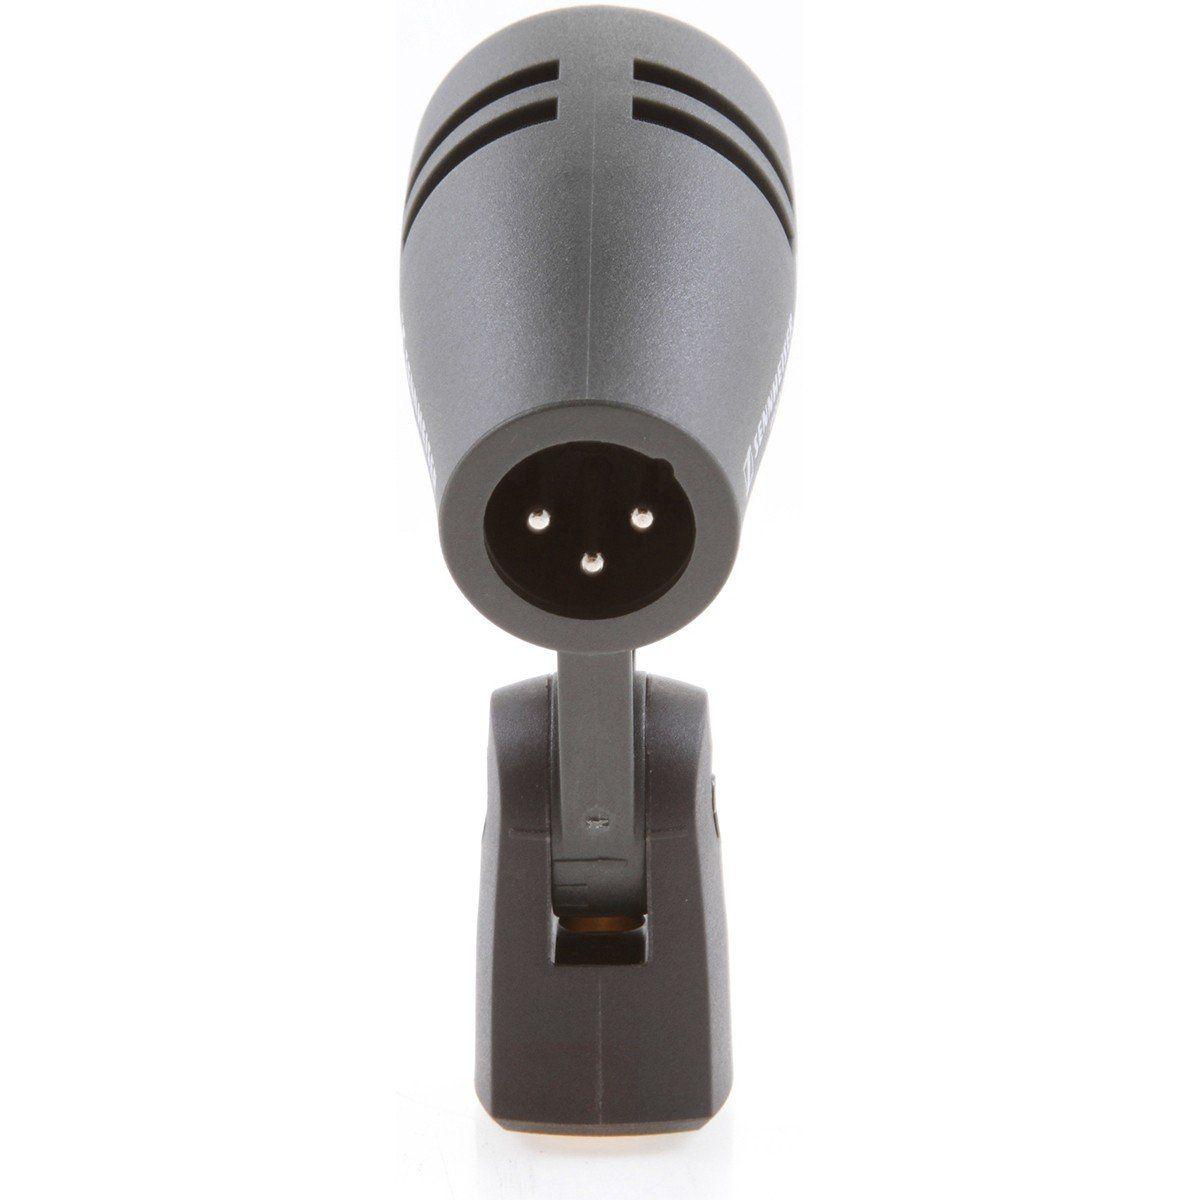 Sennheiser E604 Microfone Sennheiser-E604 Dinâmico Para Bateria